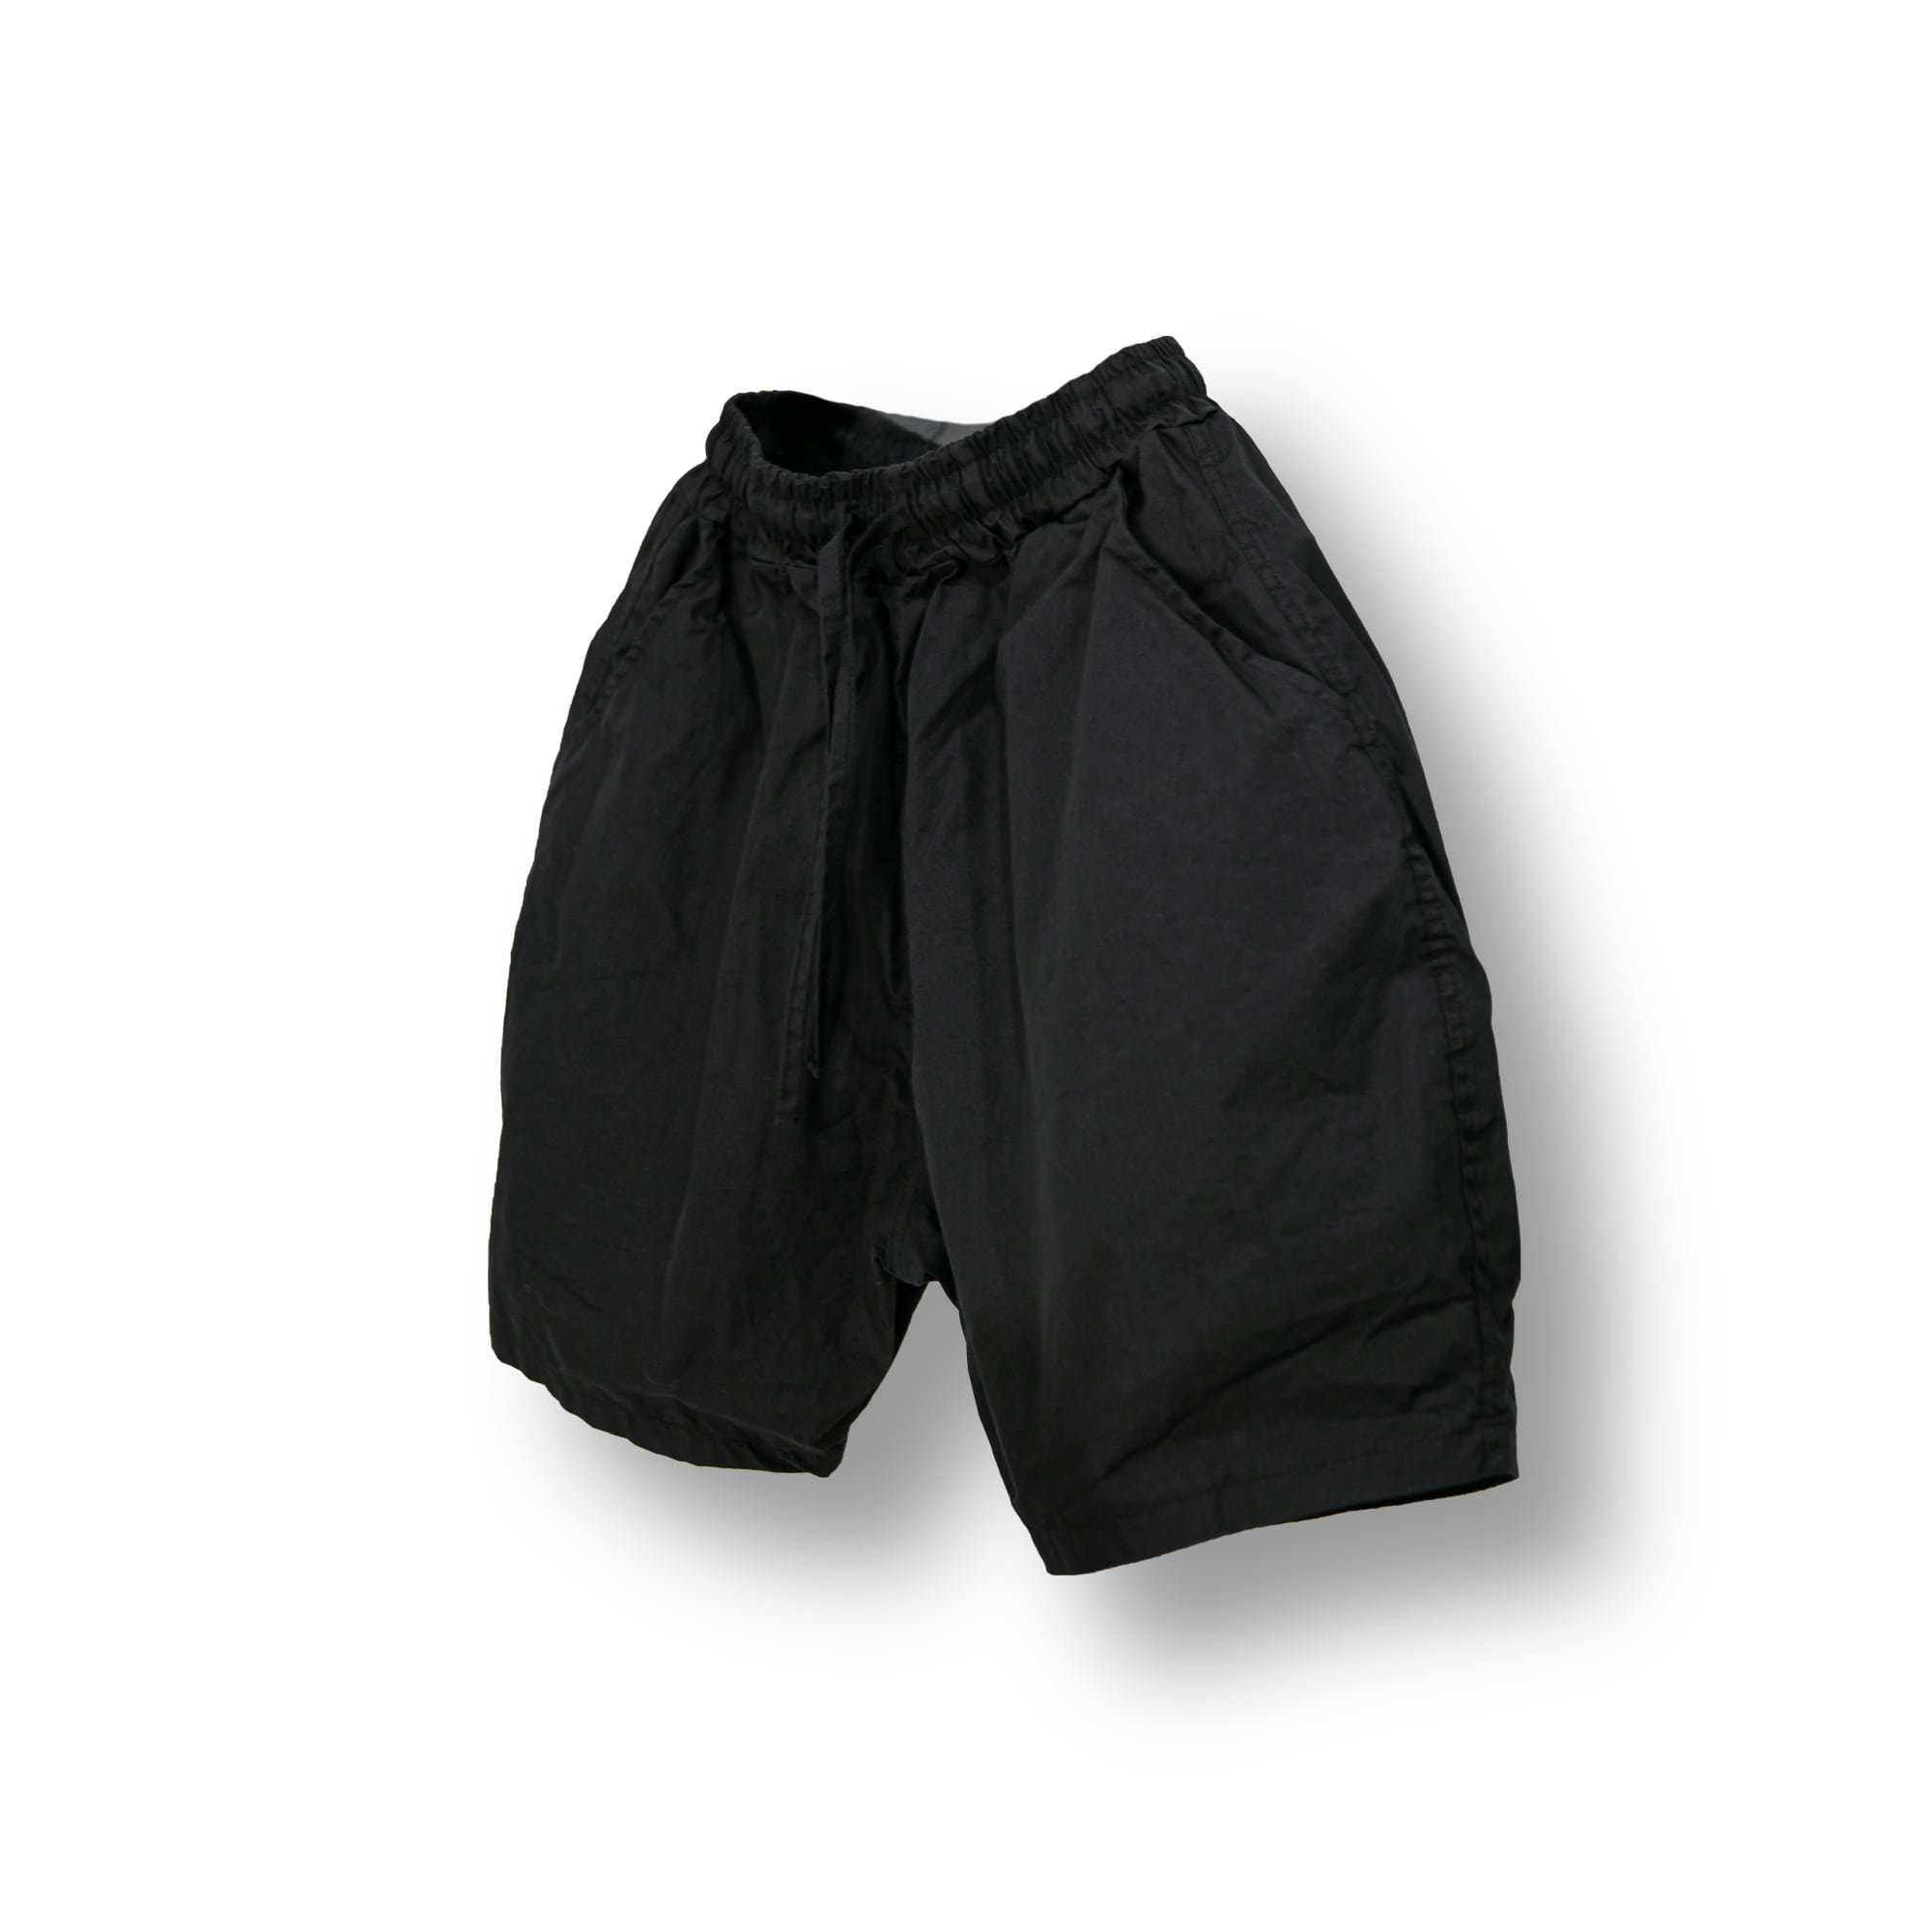 Cn Volume Shorts - Black